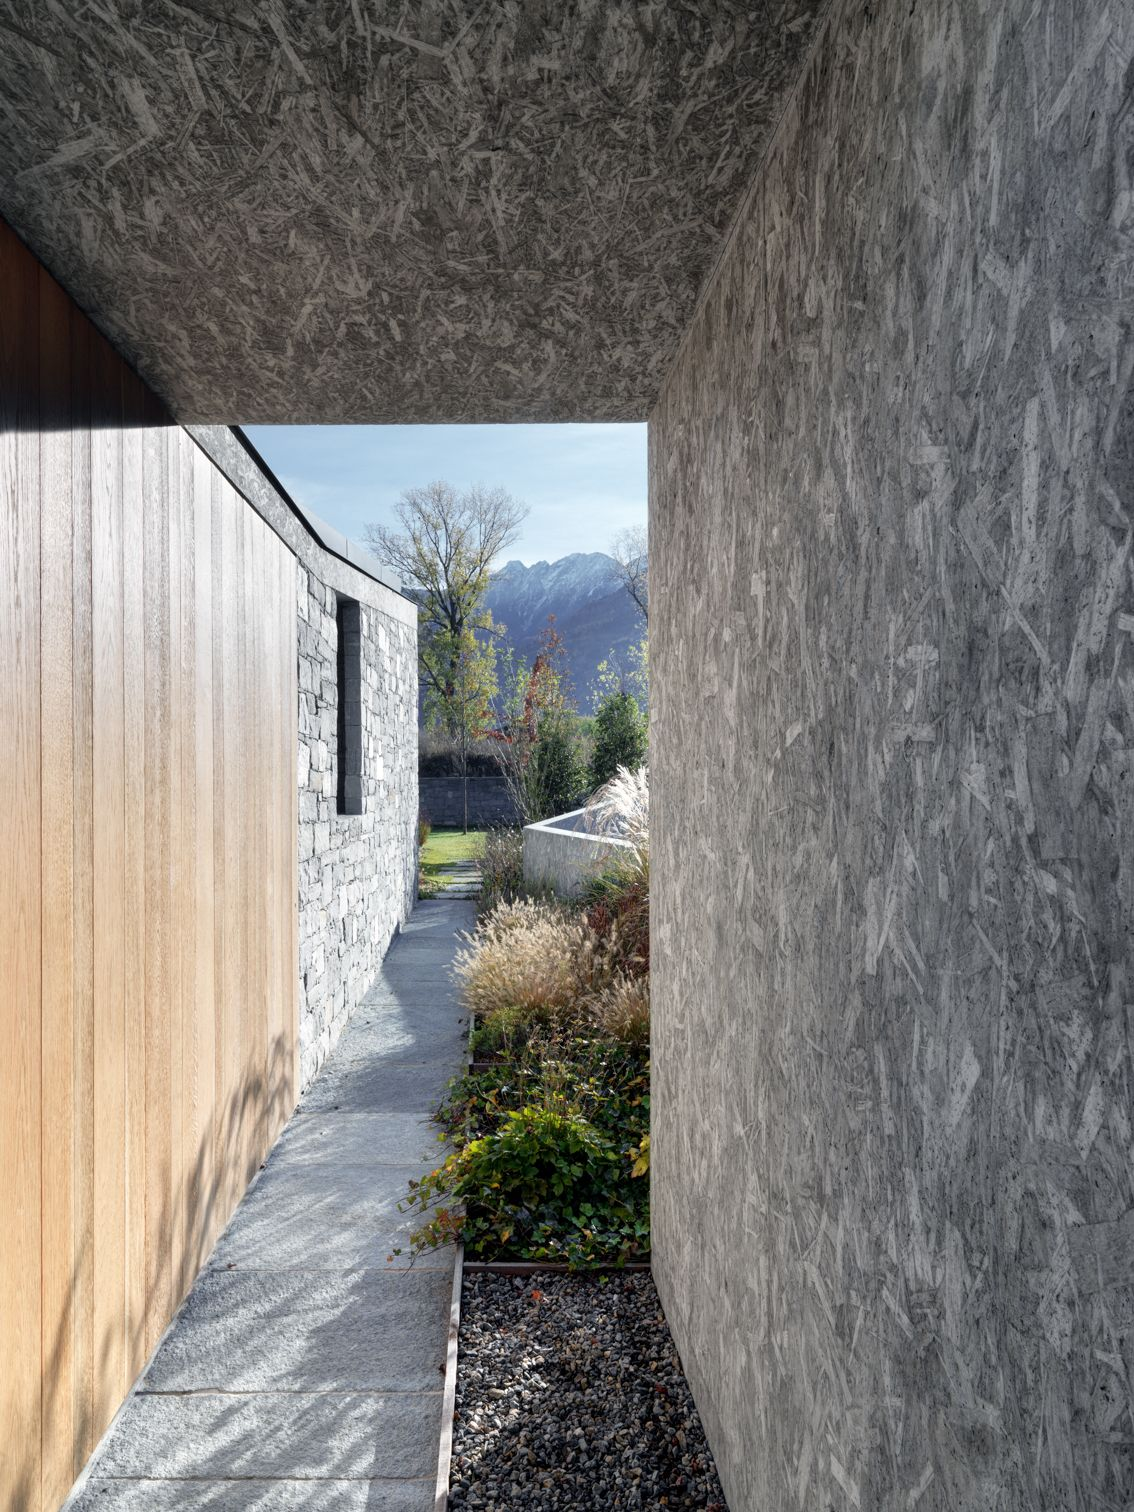 act_romegialli . Private house with patio .  Cosio Valtellino afasia (6)